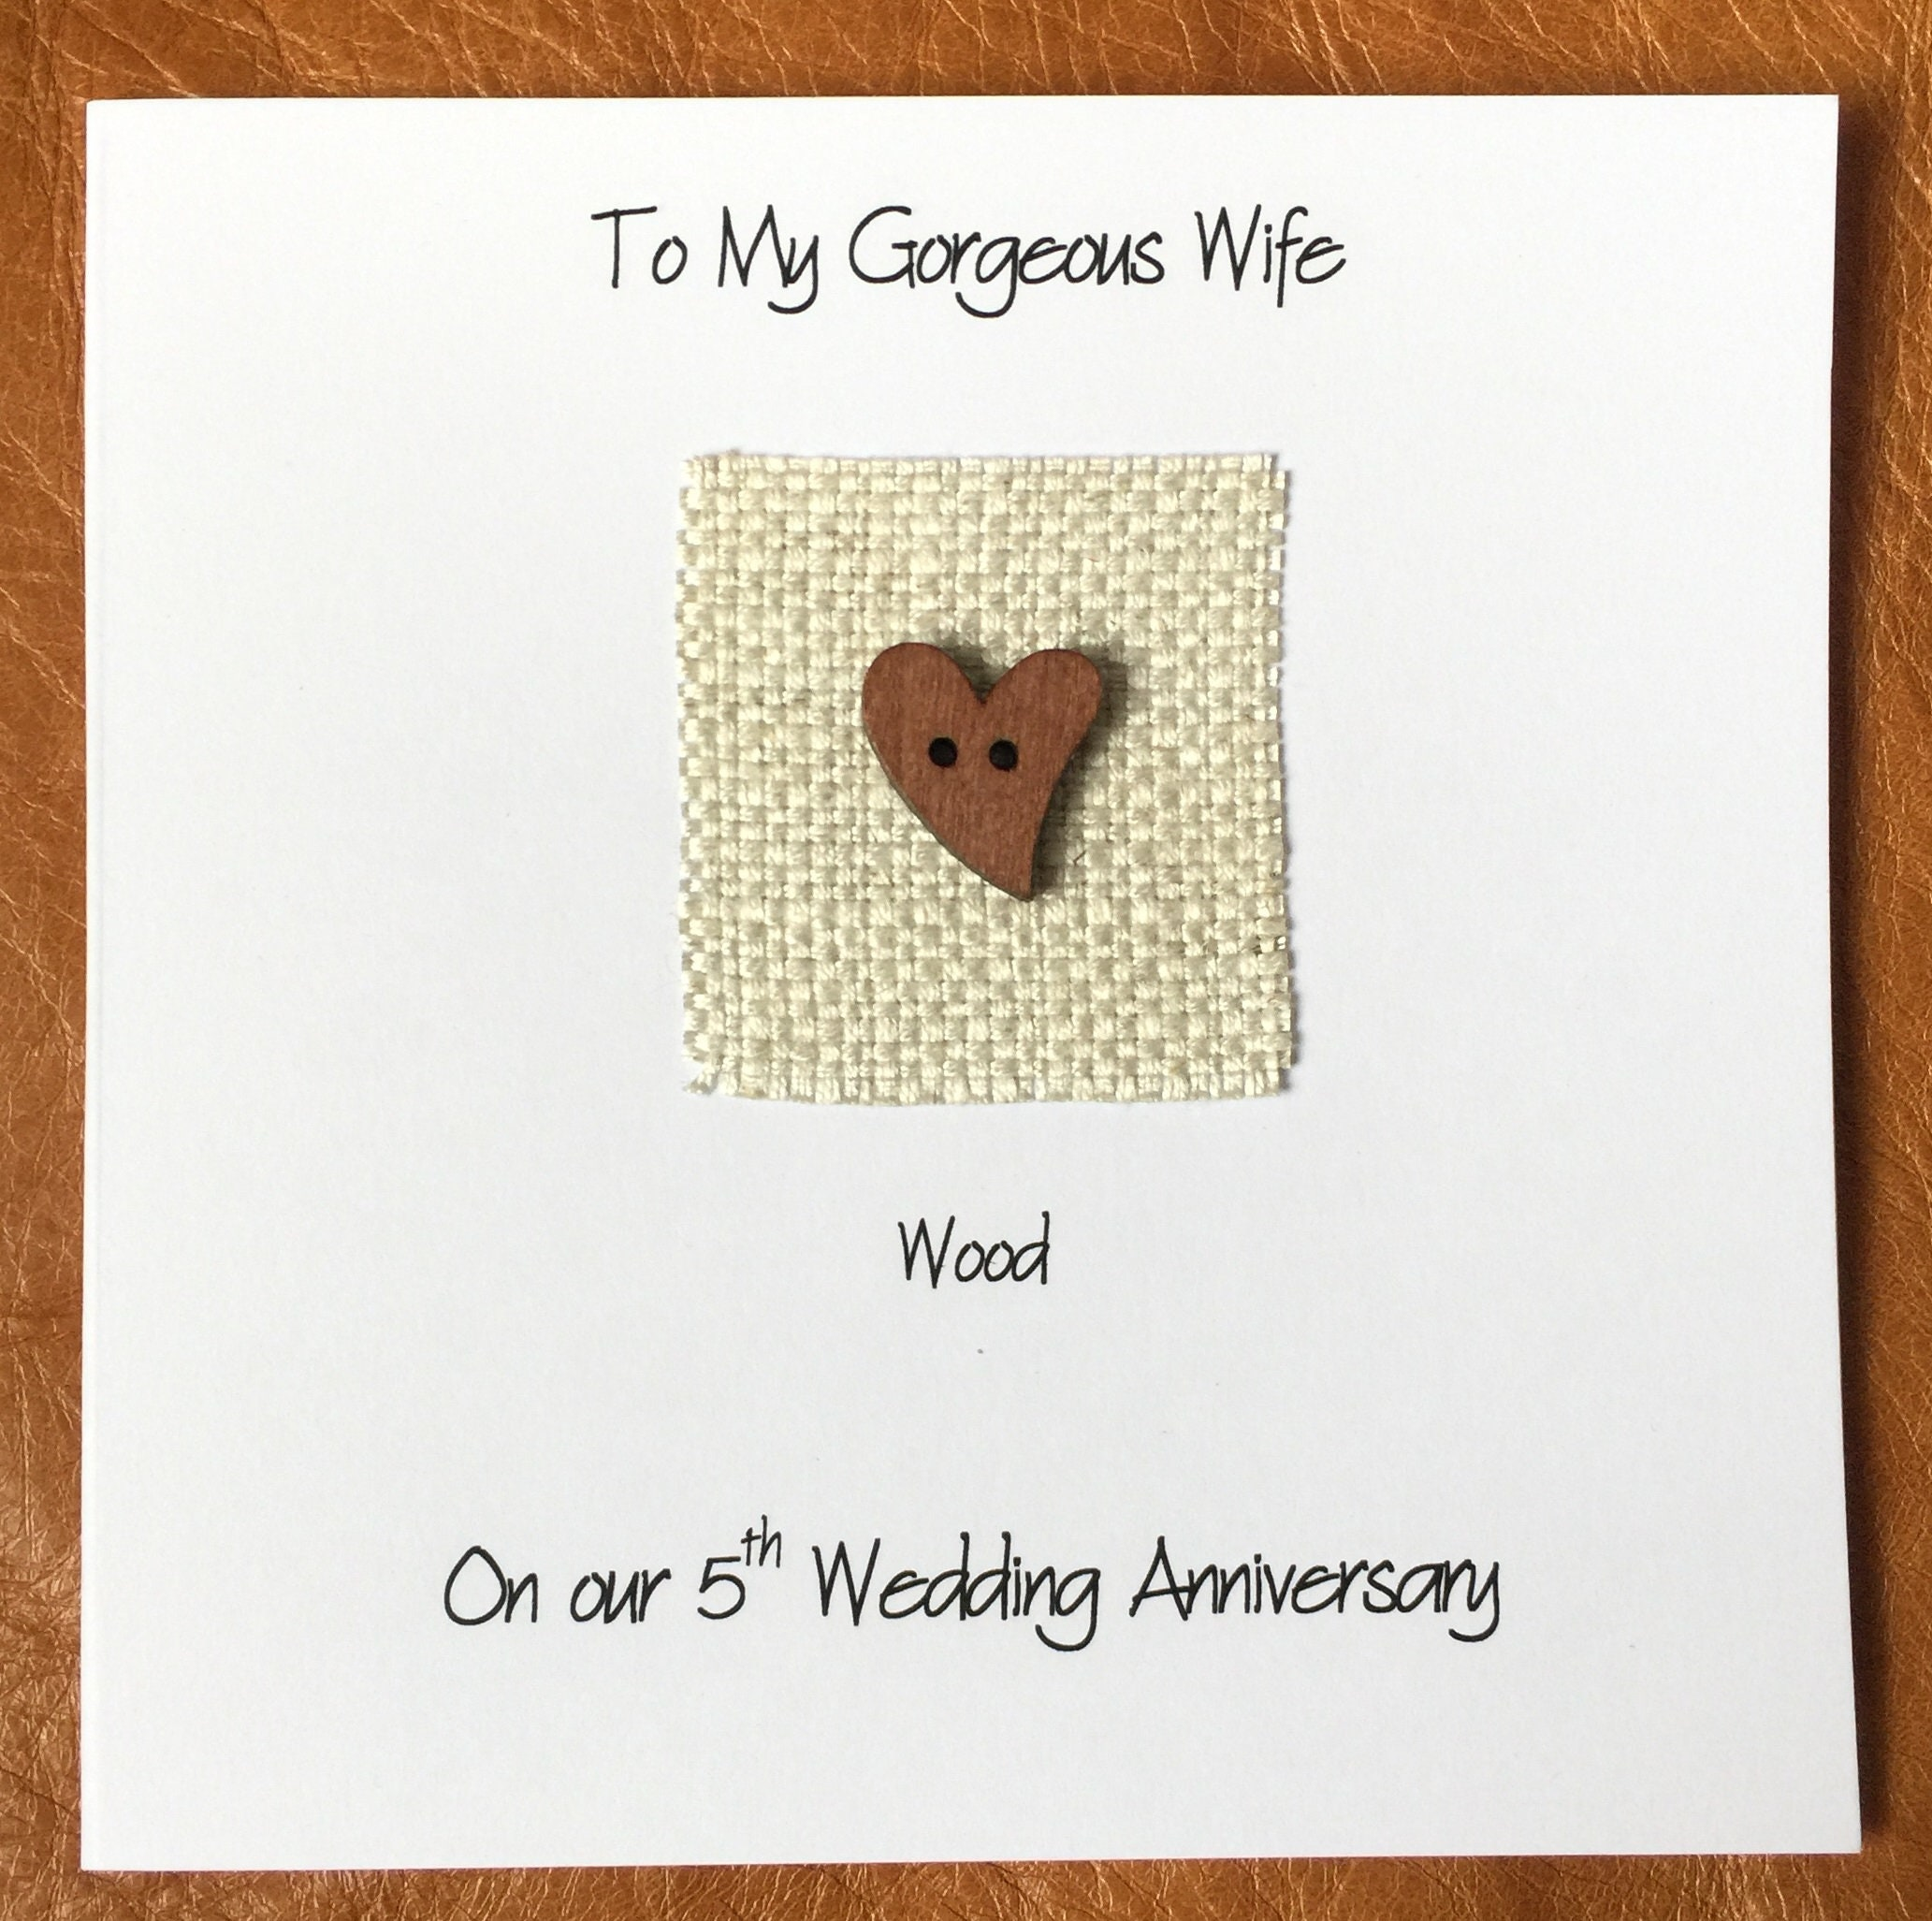 5th Wedding Anniversary Card Wood Anniversary Handmade Greeting Cards